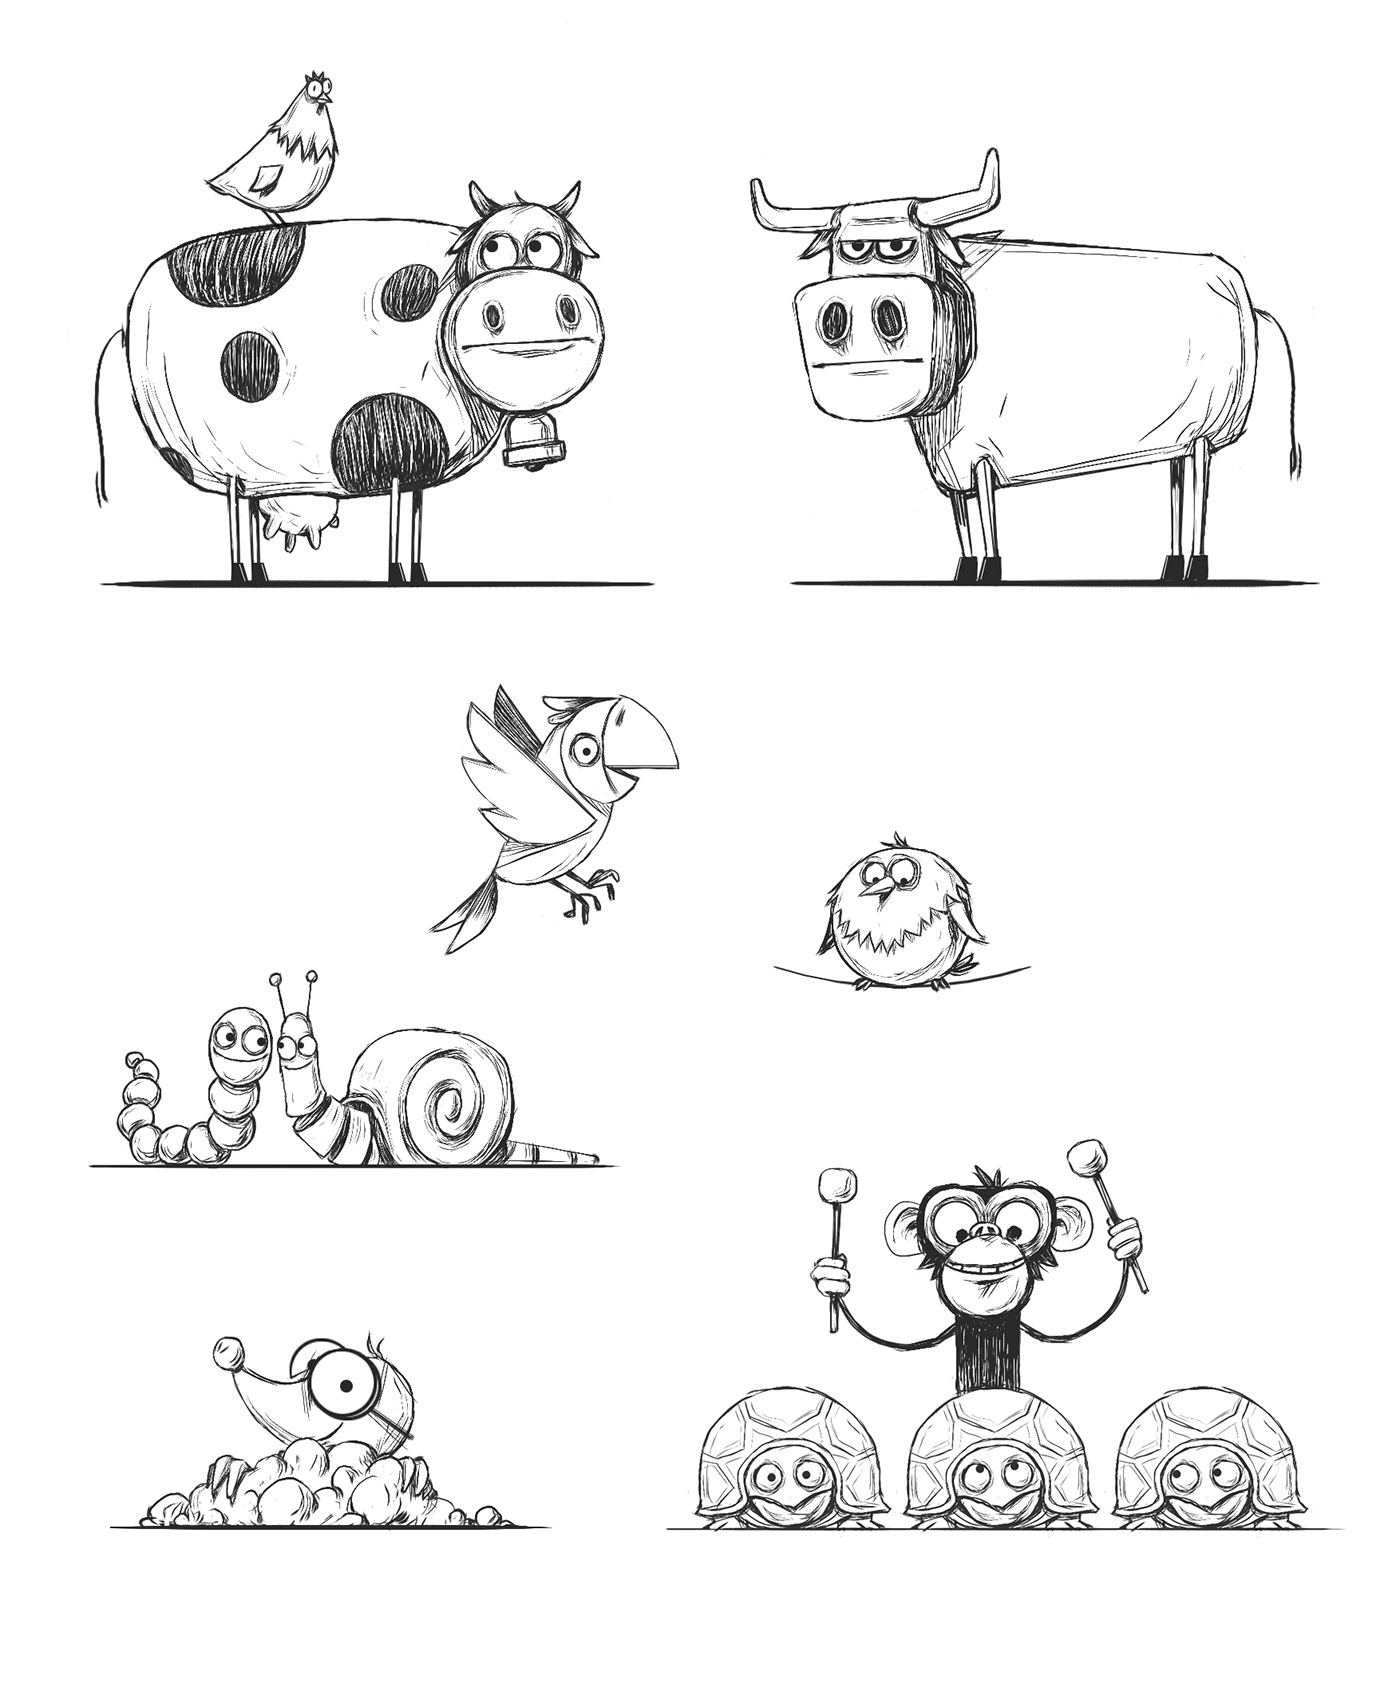 animal Candy craft farm kids song sperlari stopmotion Ukulele Character design